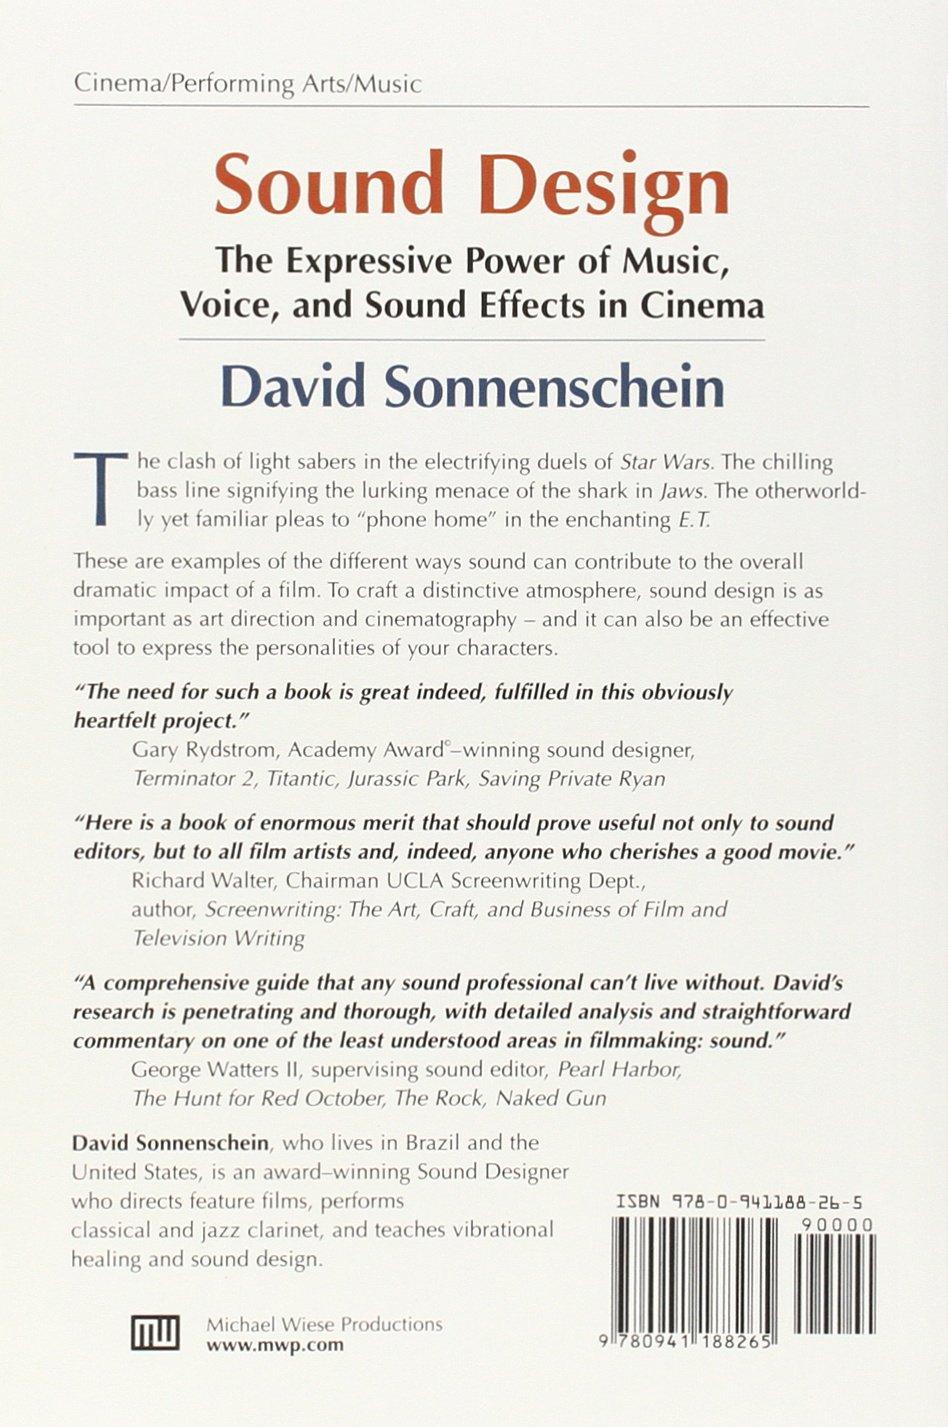 Literature craft and voice 2nd edition - Sound Design The Expressive Power Of Music Voice And Sound Effects In Cinema David Sonnenschein 8601404348785 Amazon Com Books